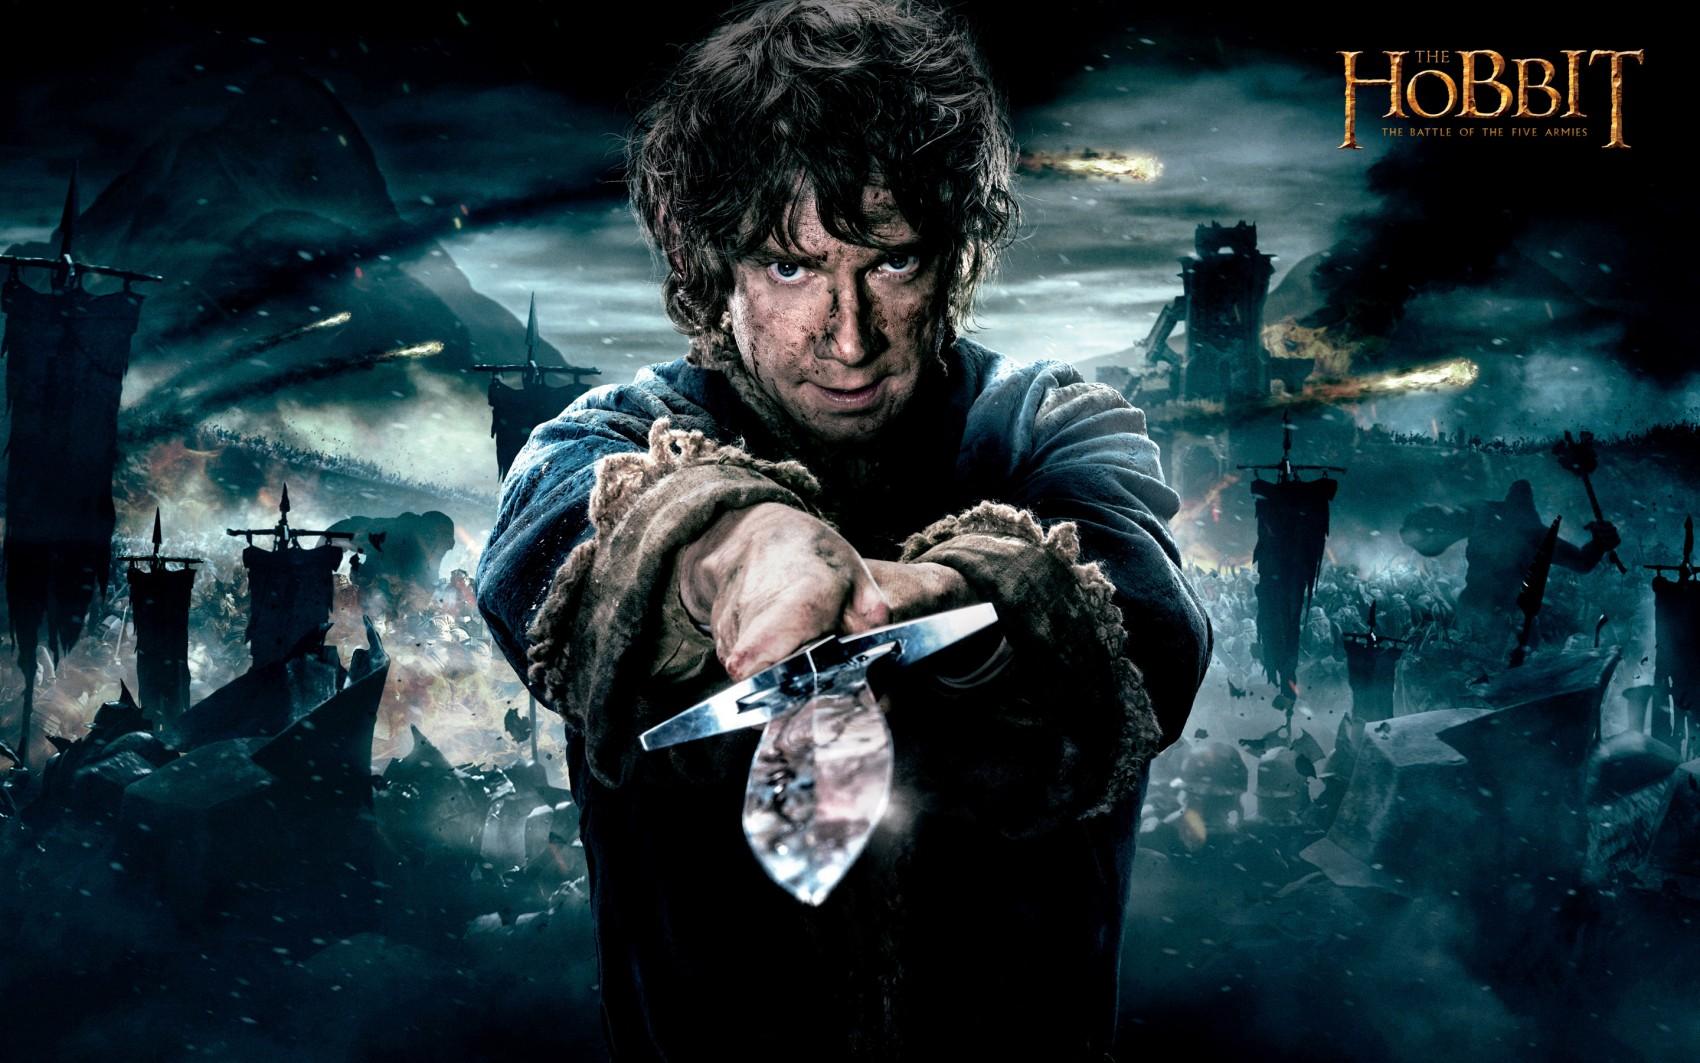 lo hobbit battaglia 5 armate